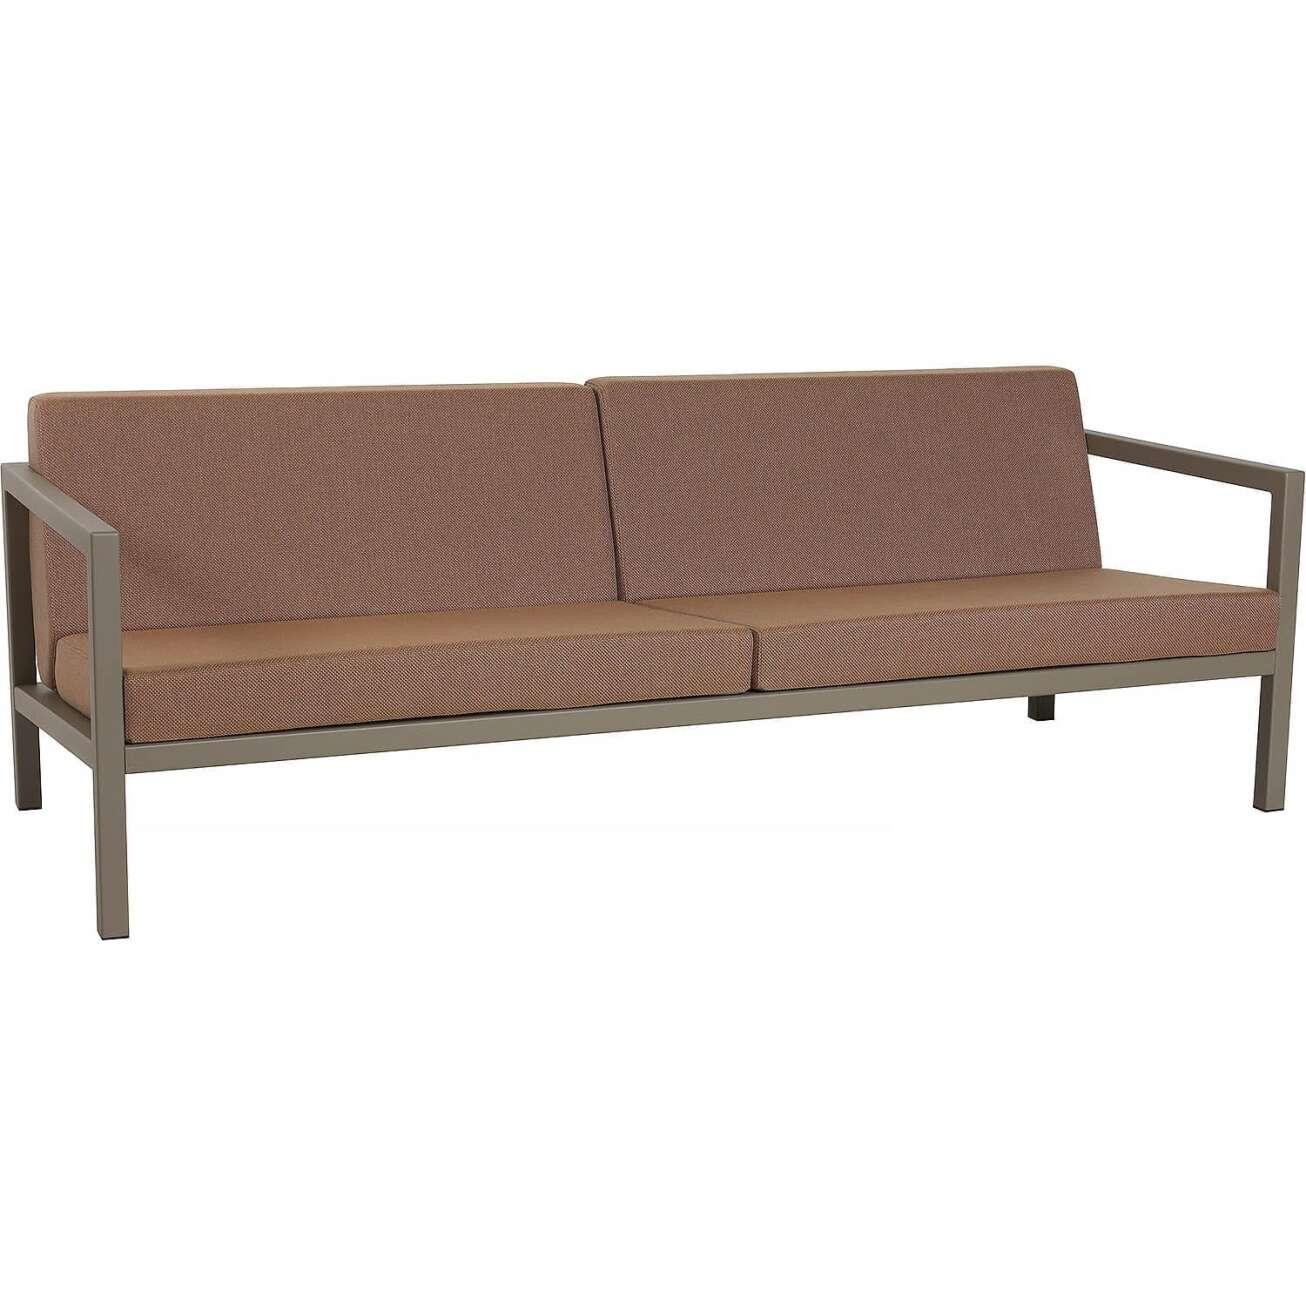 Sundays Frame 3-seter sofa i brun aluminium med brune puter